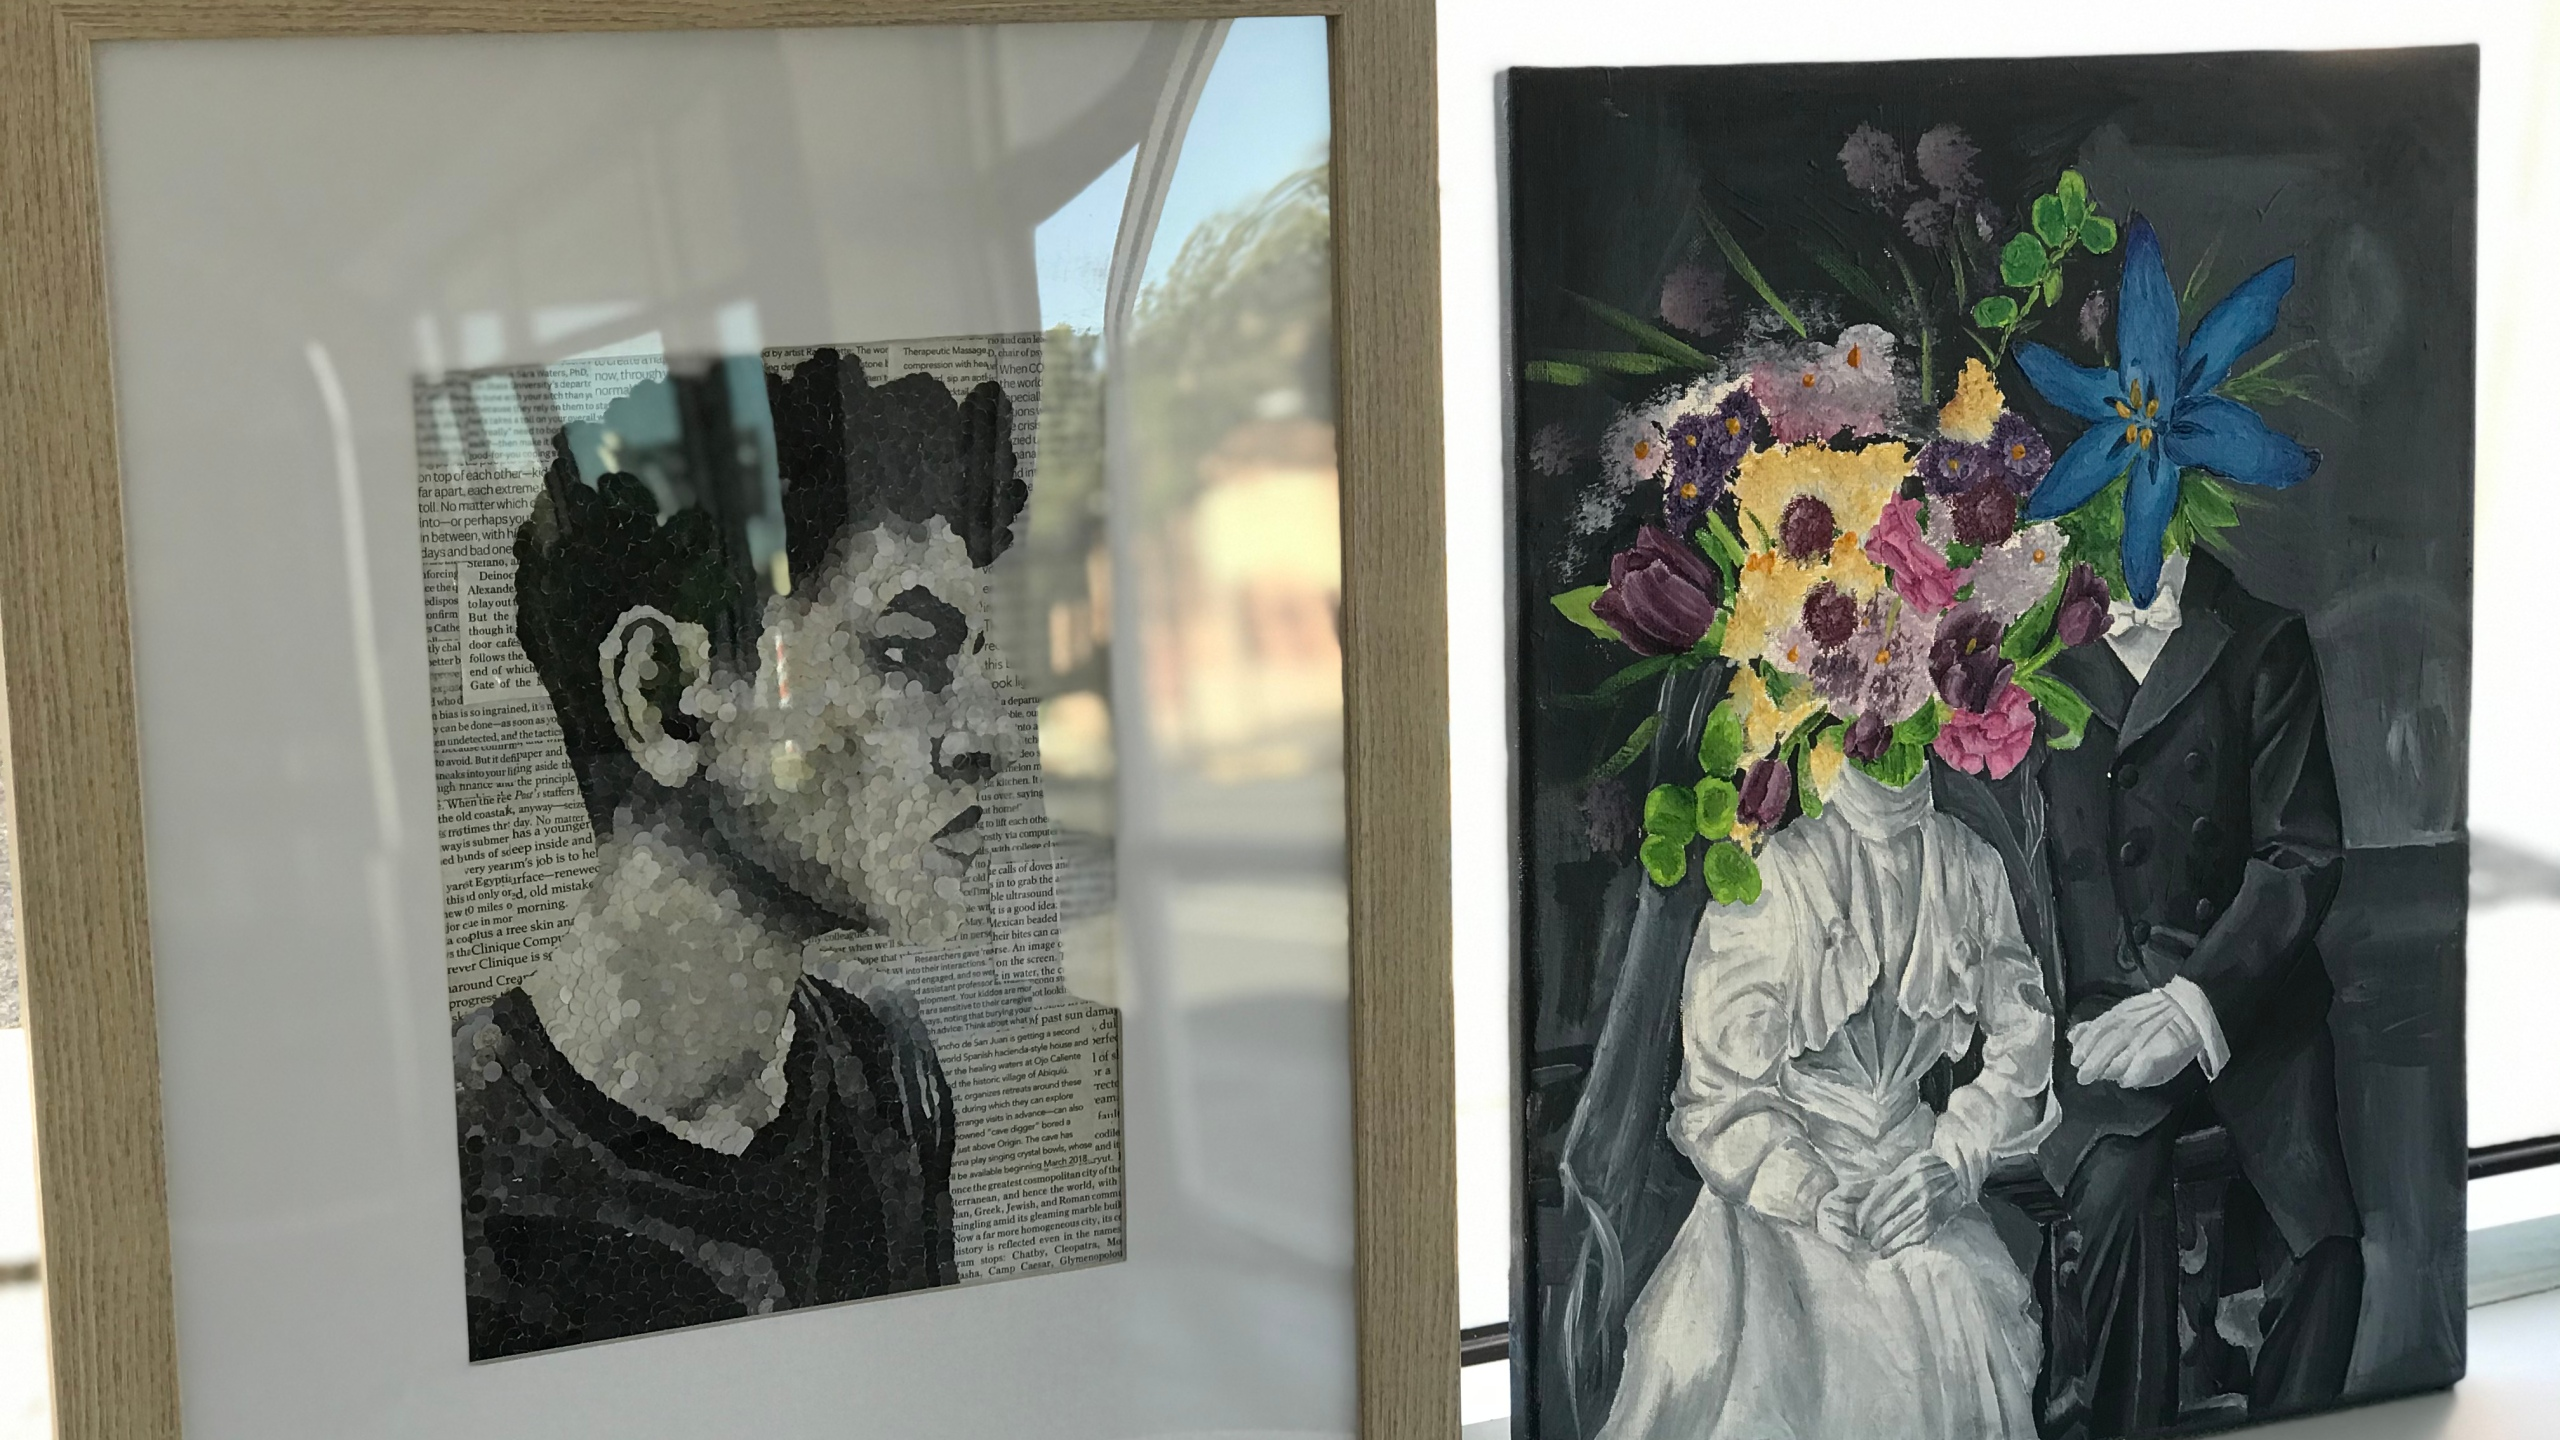 Visionaries Group Art exhibit